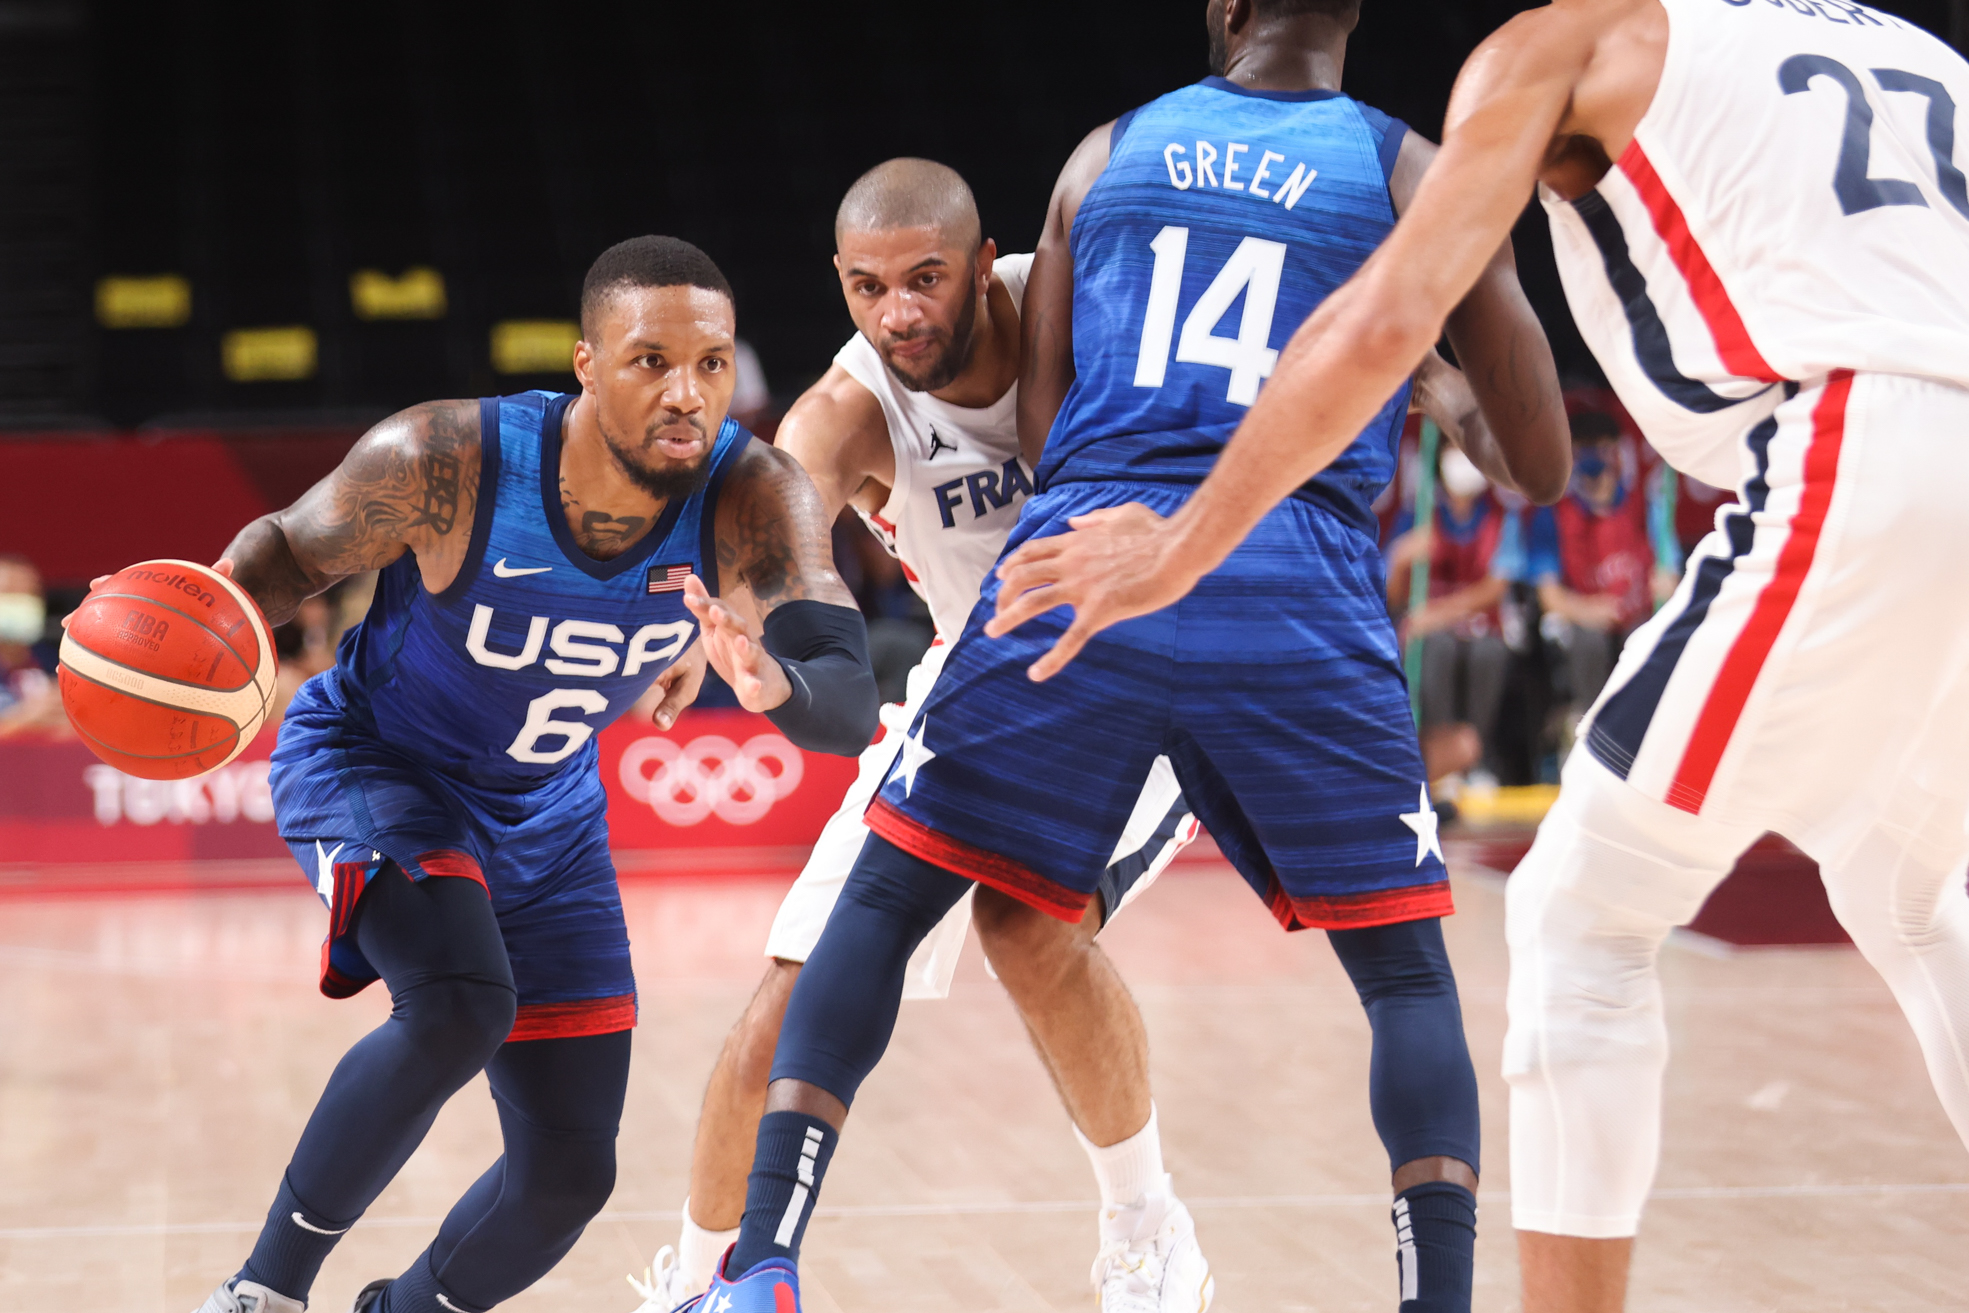 Basketball - Tokyo 2020 Olympics - Day 2